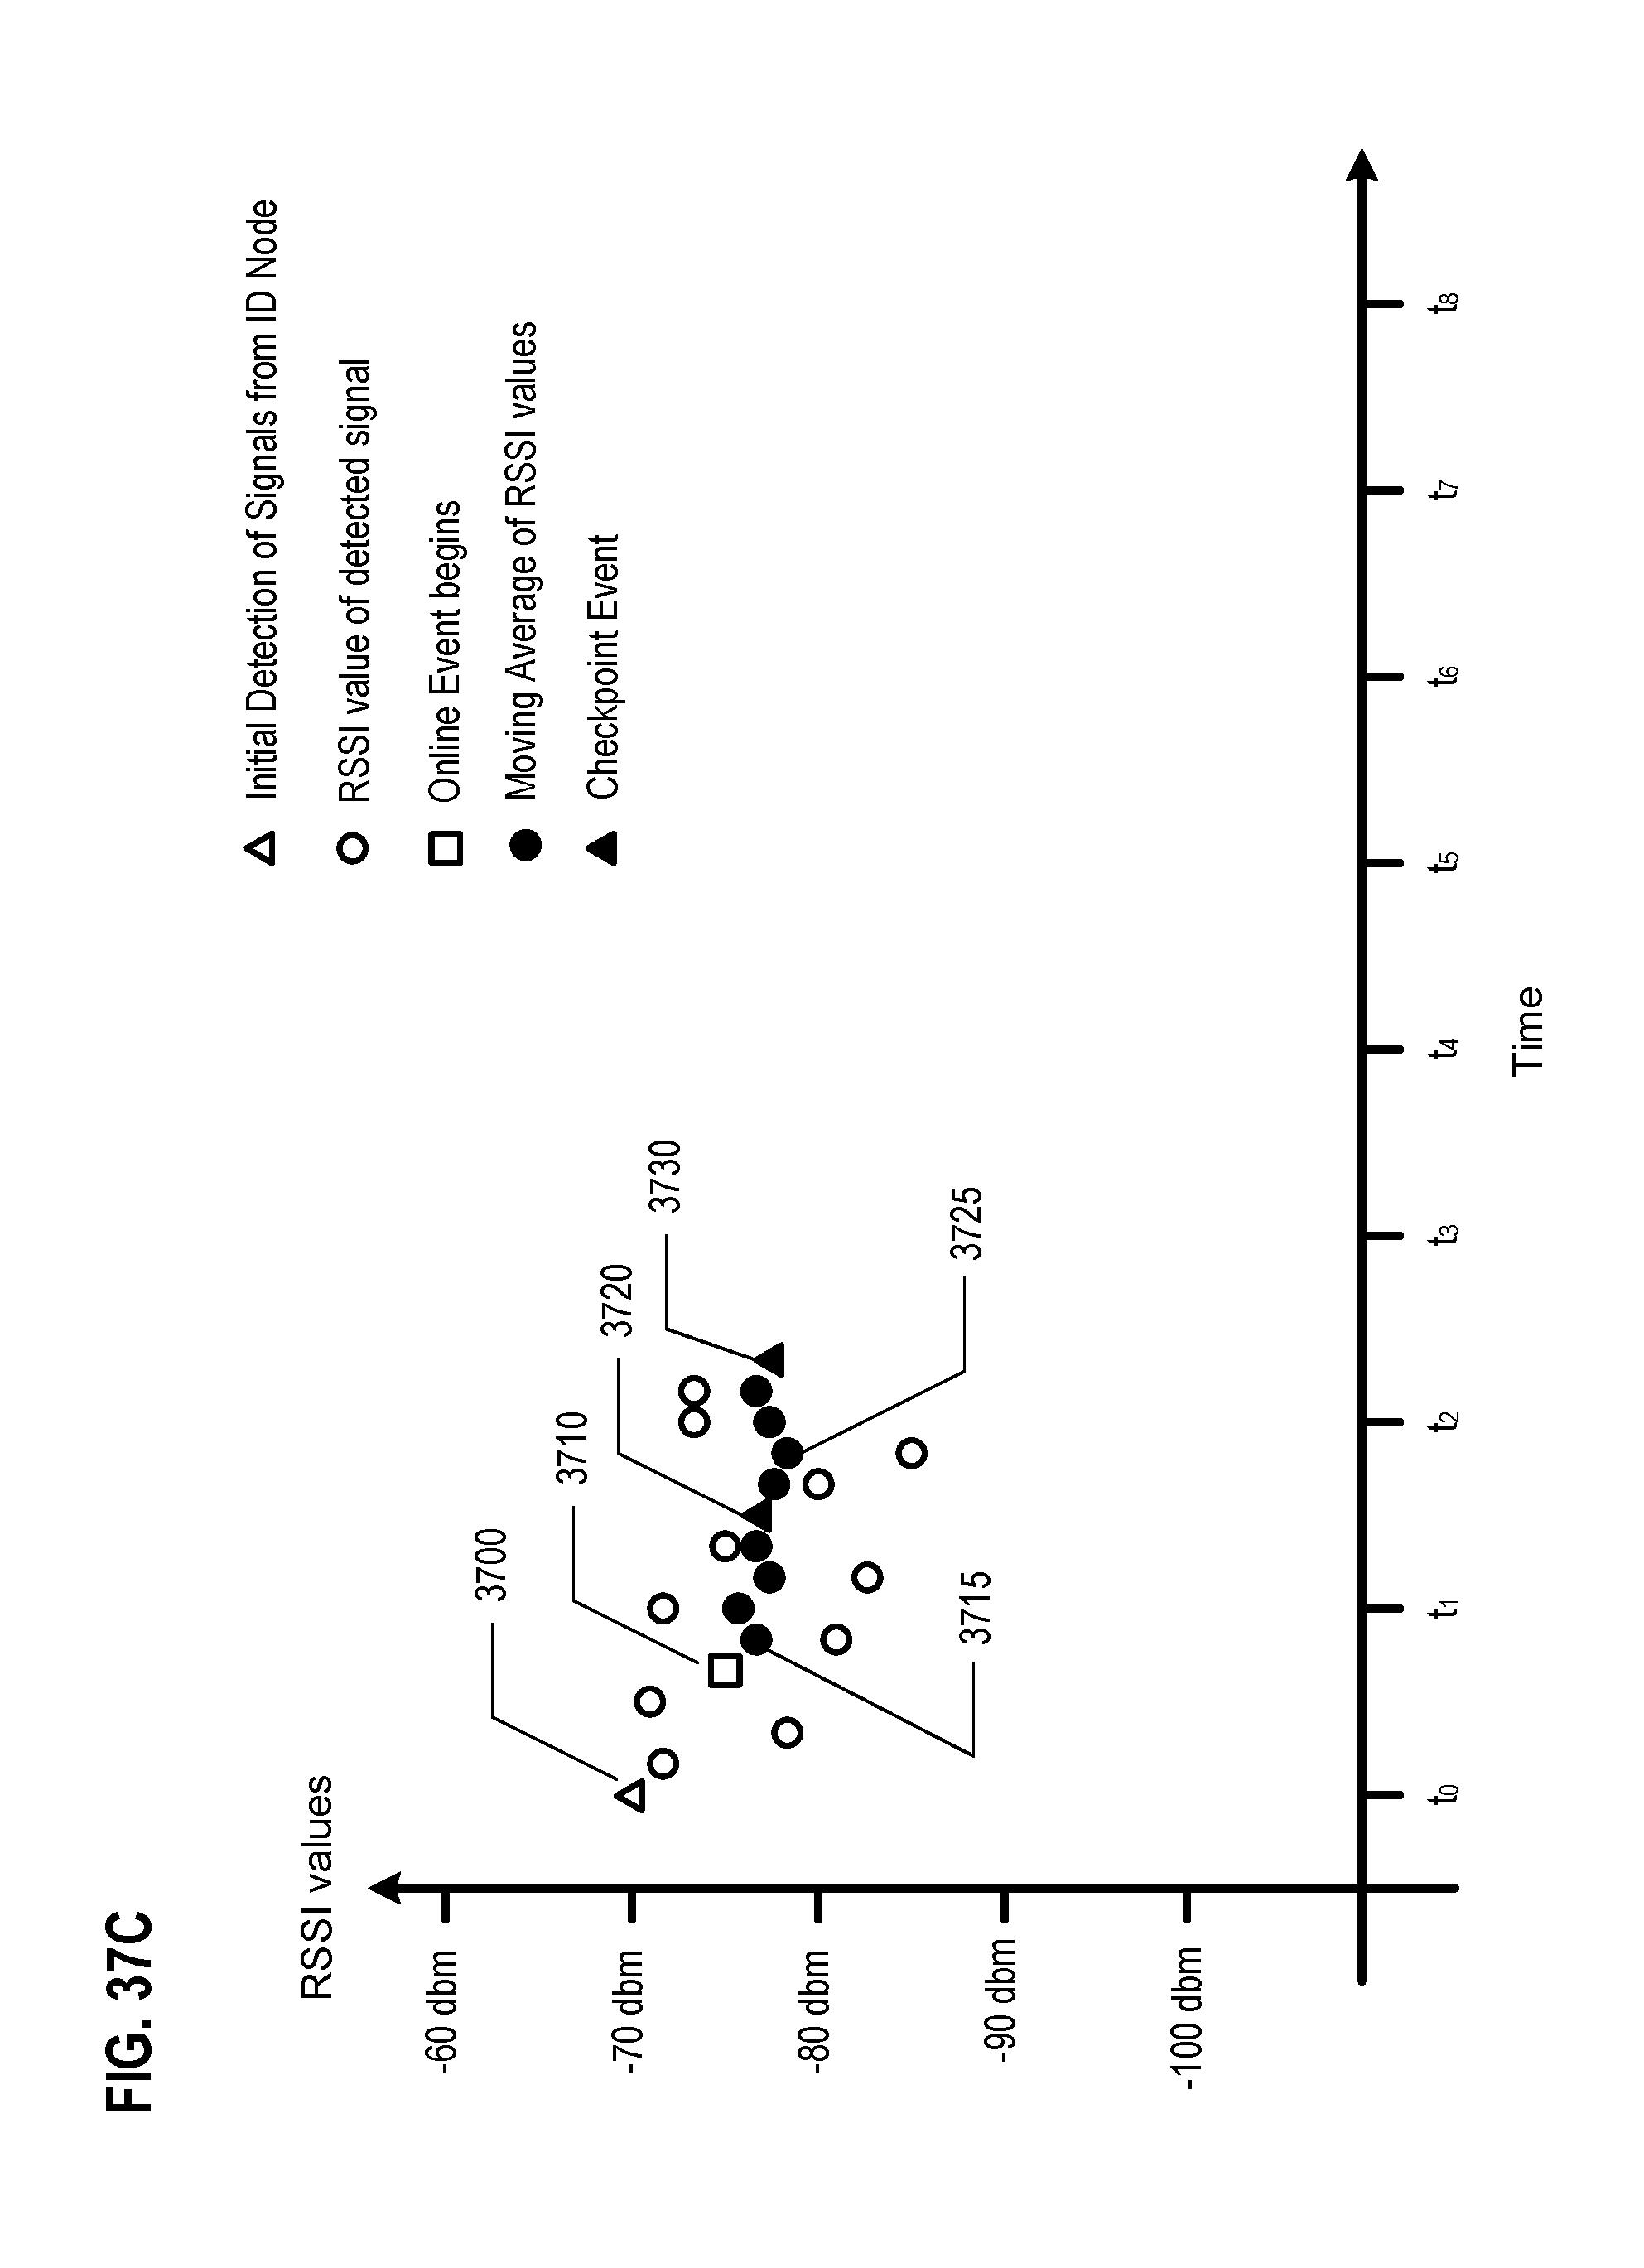 Patent US 9,973,391 B2